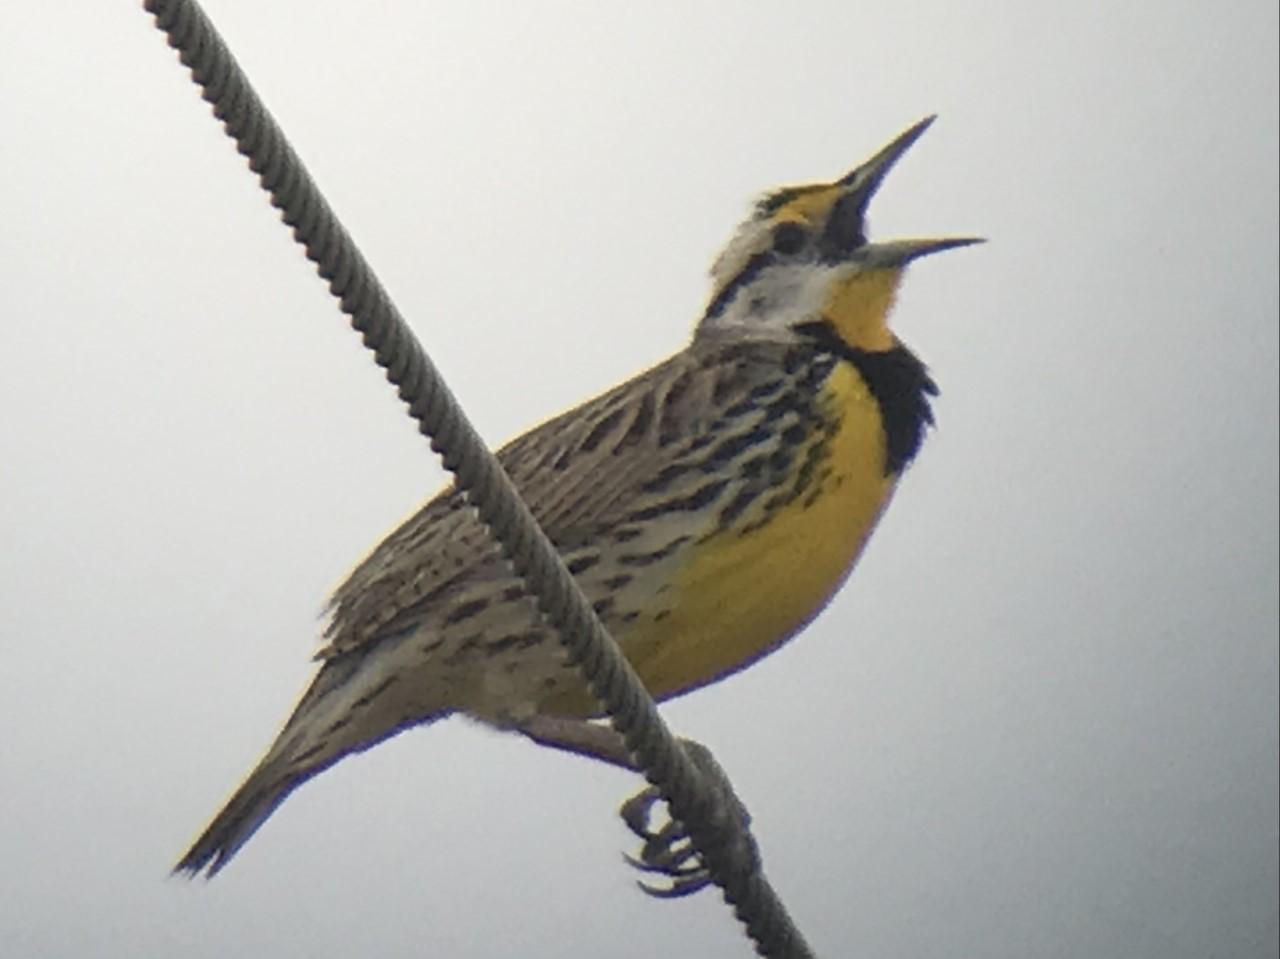 Eastern Meadowlark singing at the Richie Pond Preserve